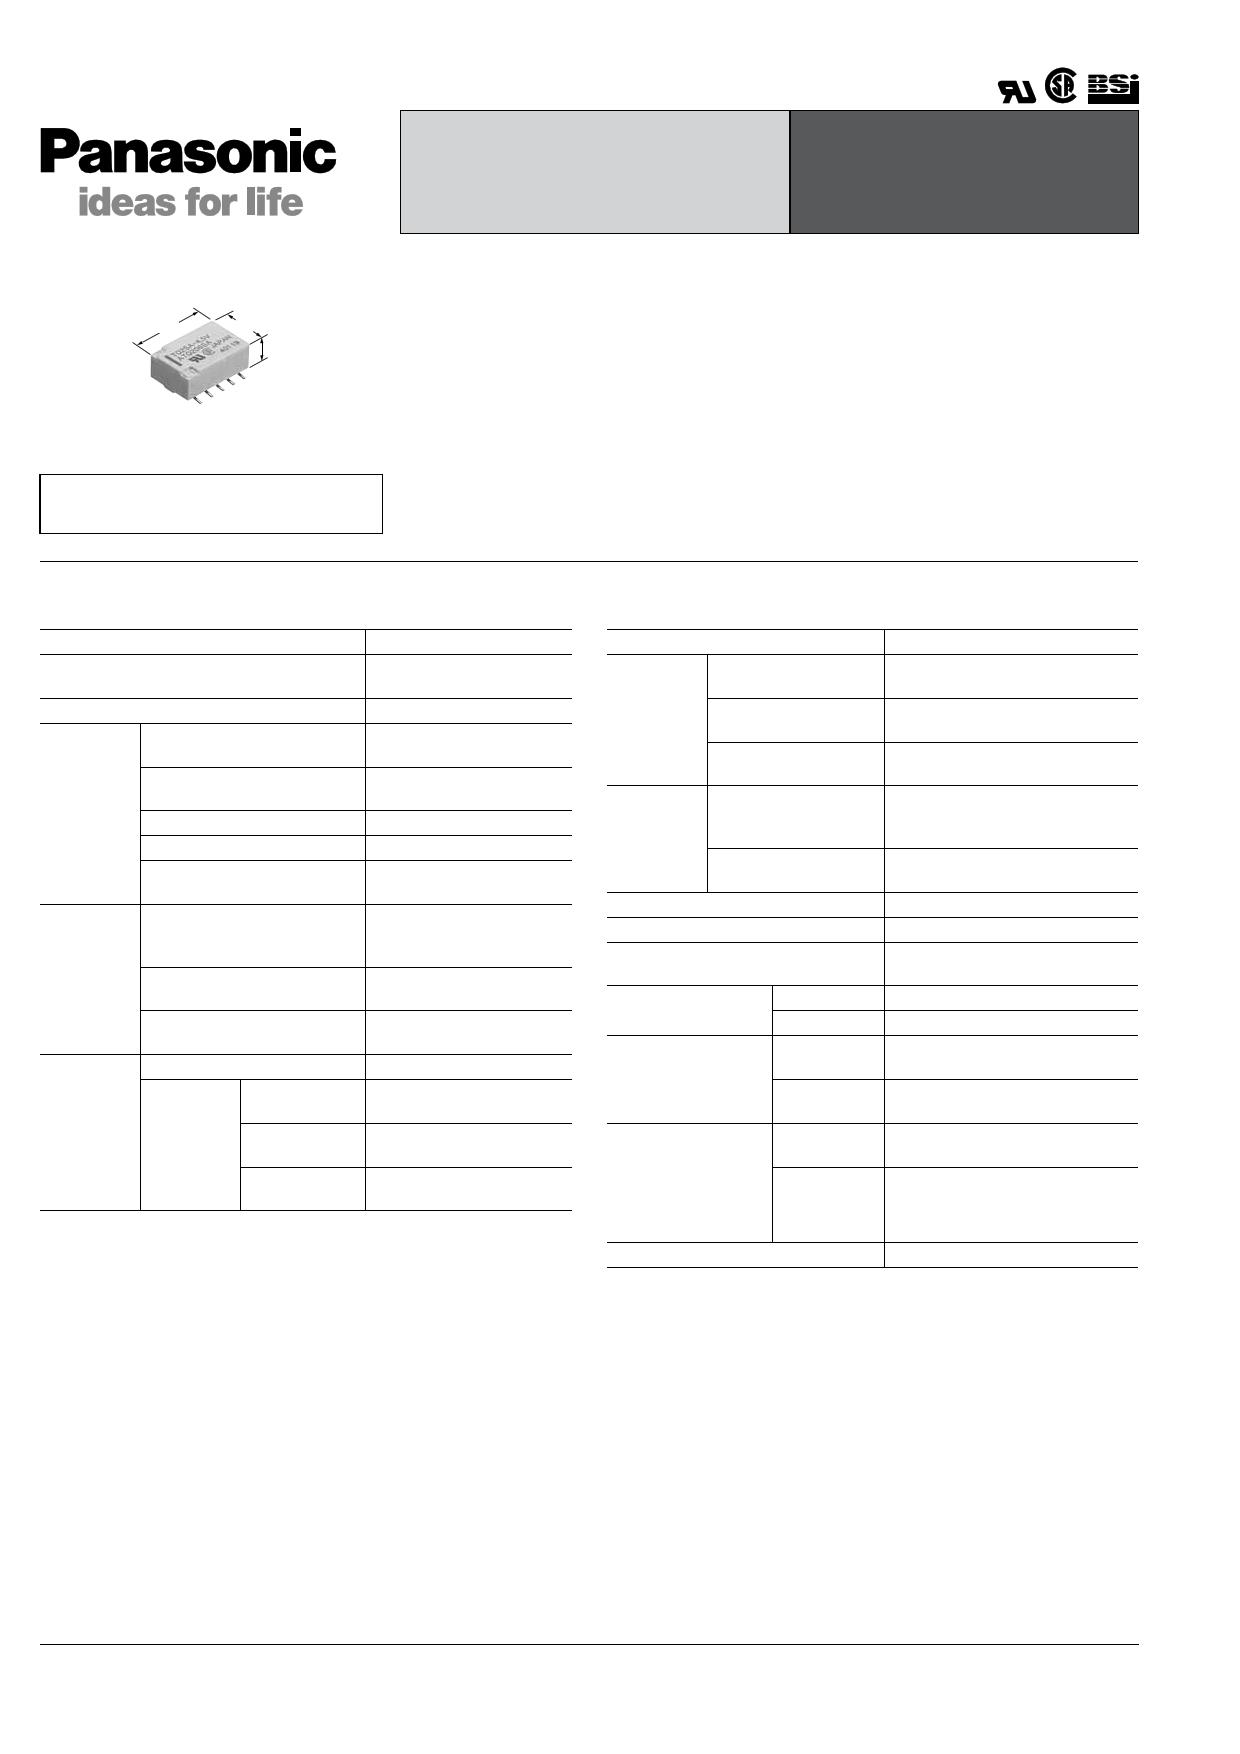 TQ2SL-L2-9V 데이터시트 및 TQ2SL-L2-9V PDF